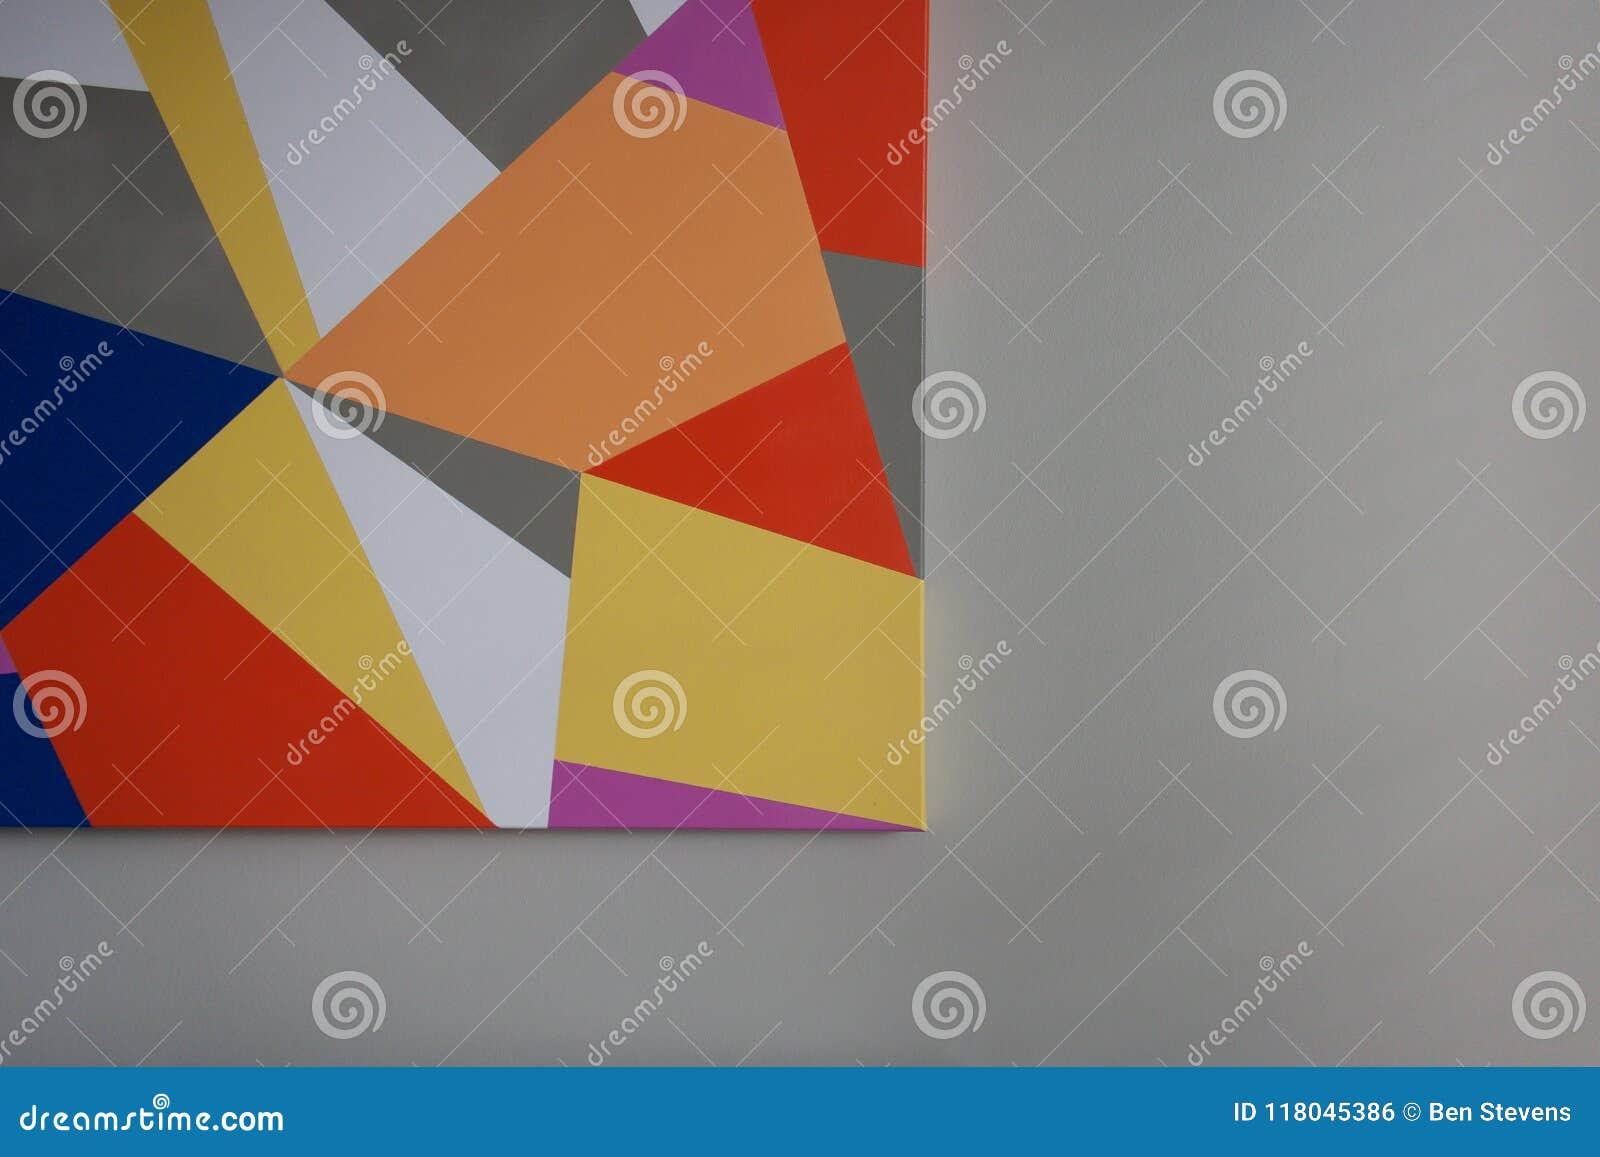 ef157d8fd70 Interior design image of geometric art print against a gray wall